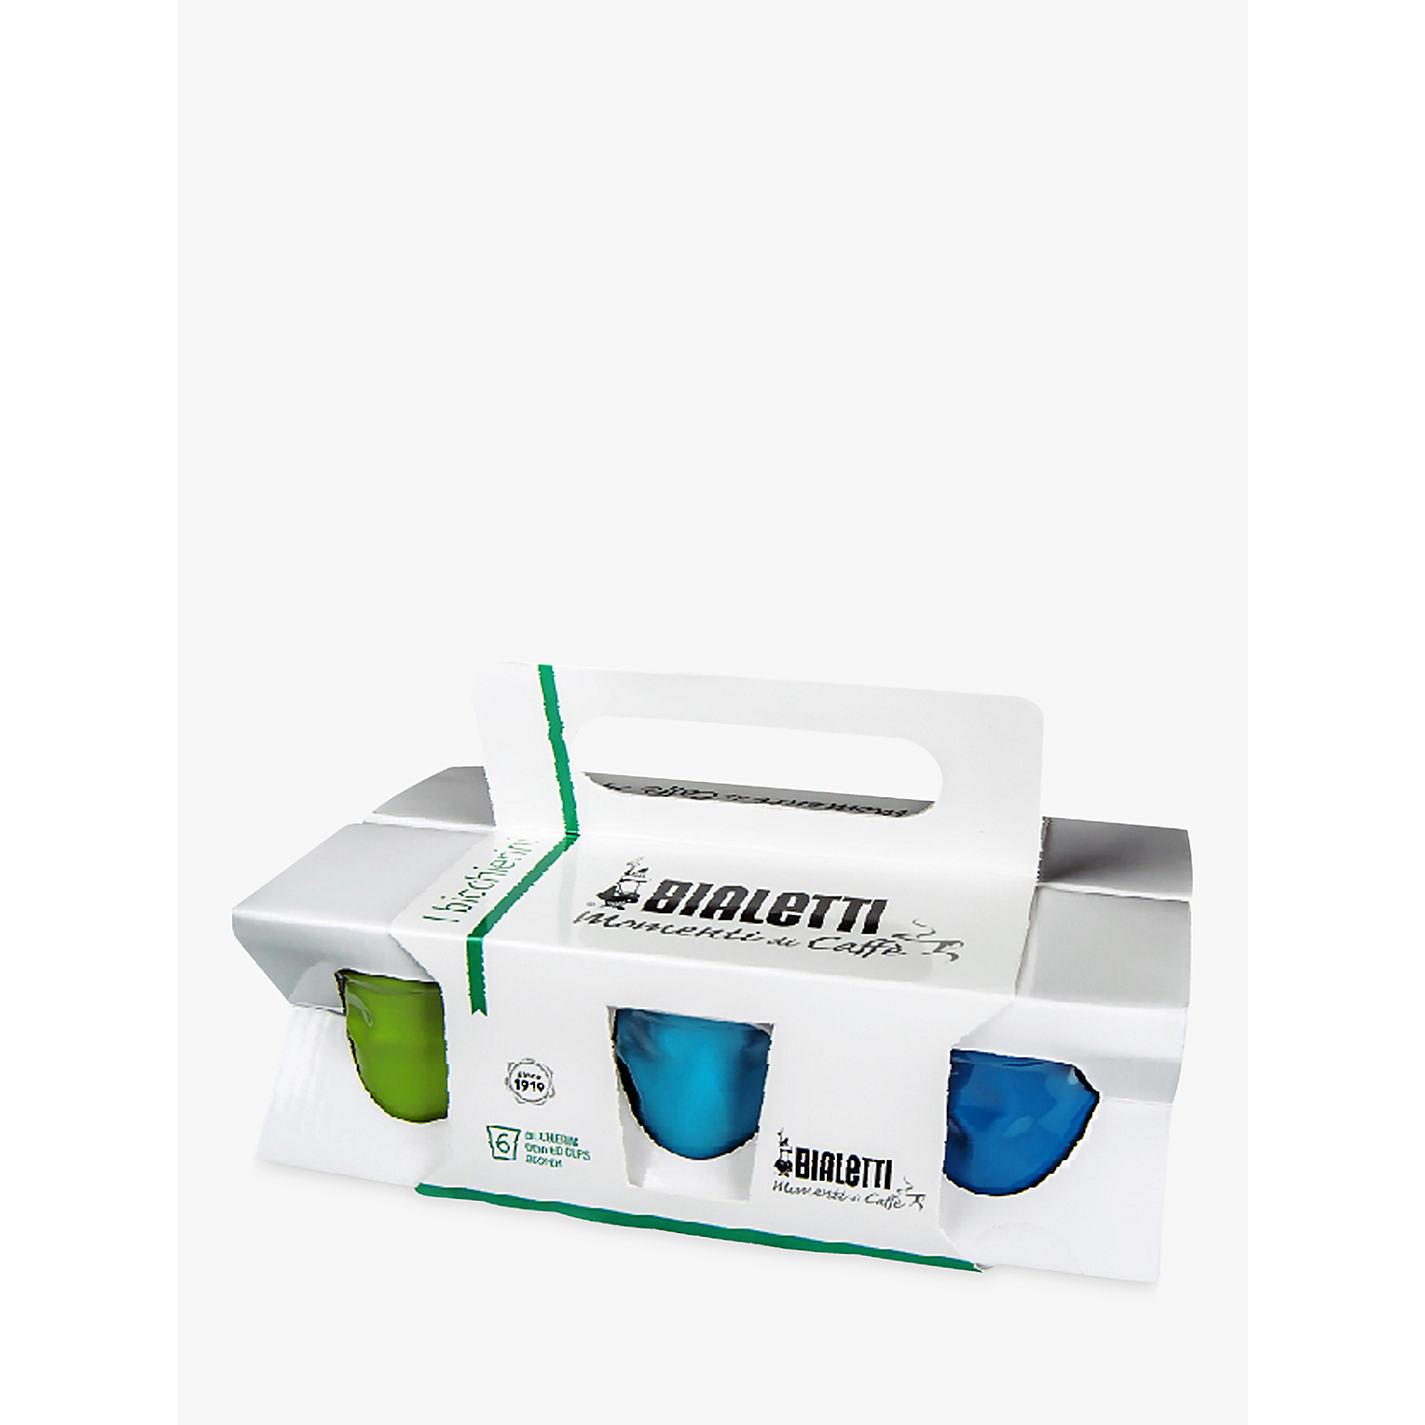 buy bialetti espresso cups set of  multi  john lewis -  buy bialetti espresso cups set of  multi online at johnlewiscom